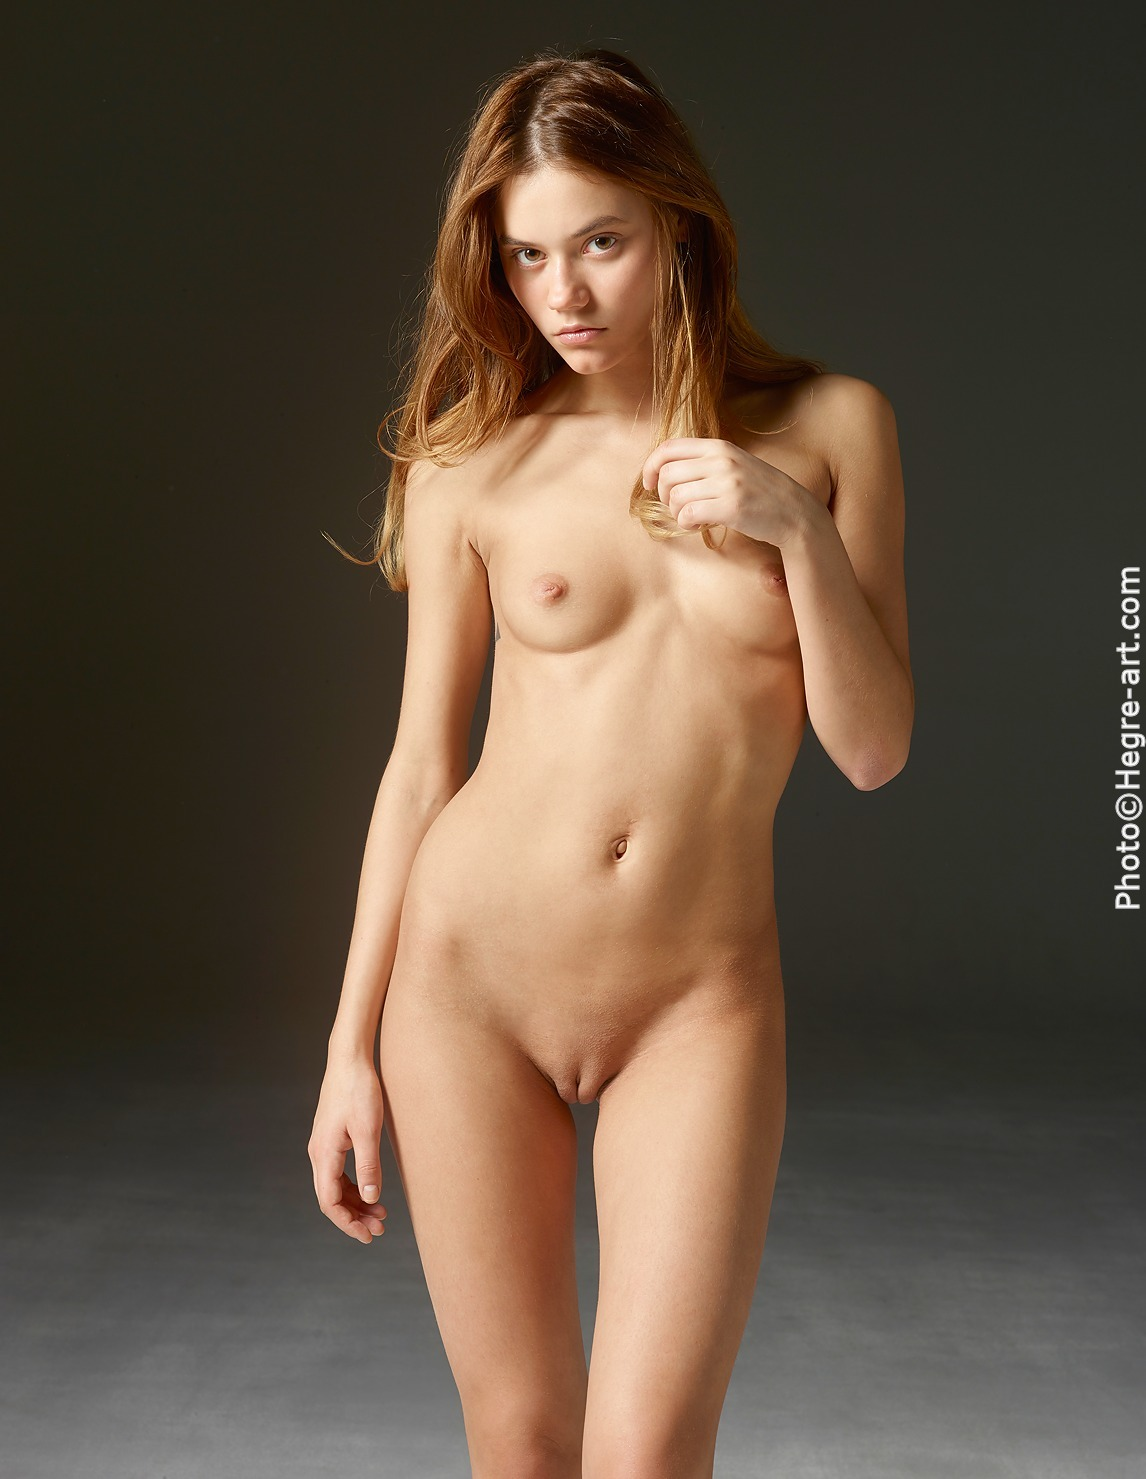 hegre arts tone damli nude